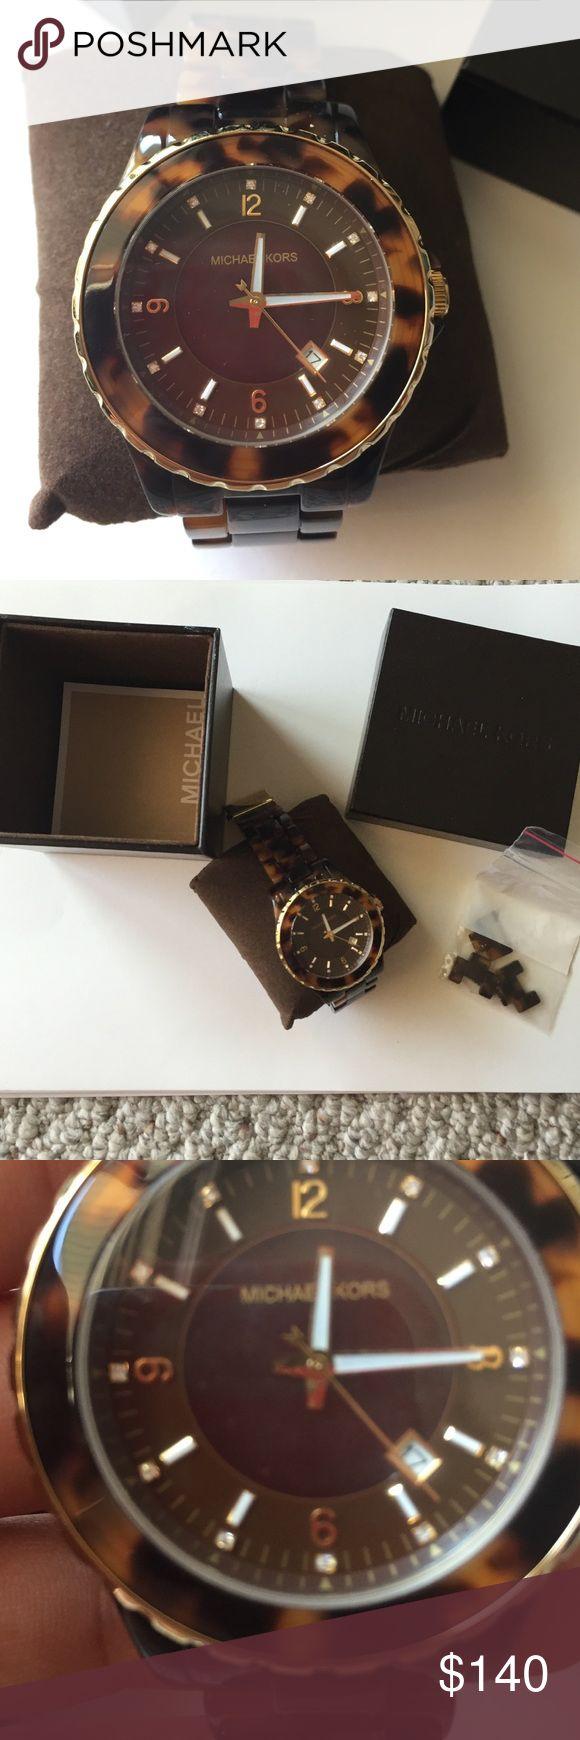 Michael Kors tortoise watch (women's) Michael Kors tortoise watch. Comes with original box and links Michael Kors Accessories Watches